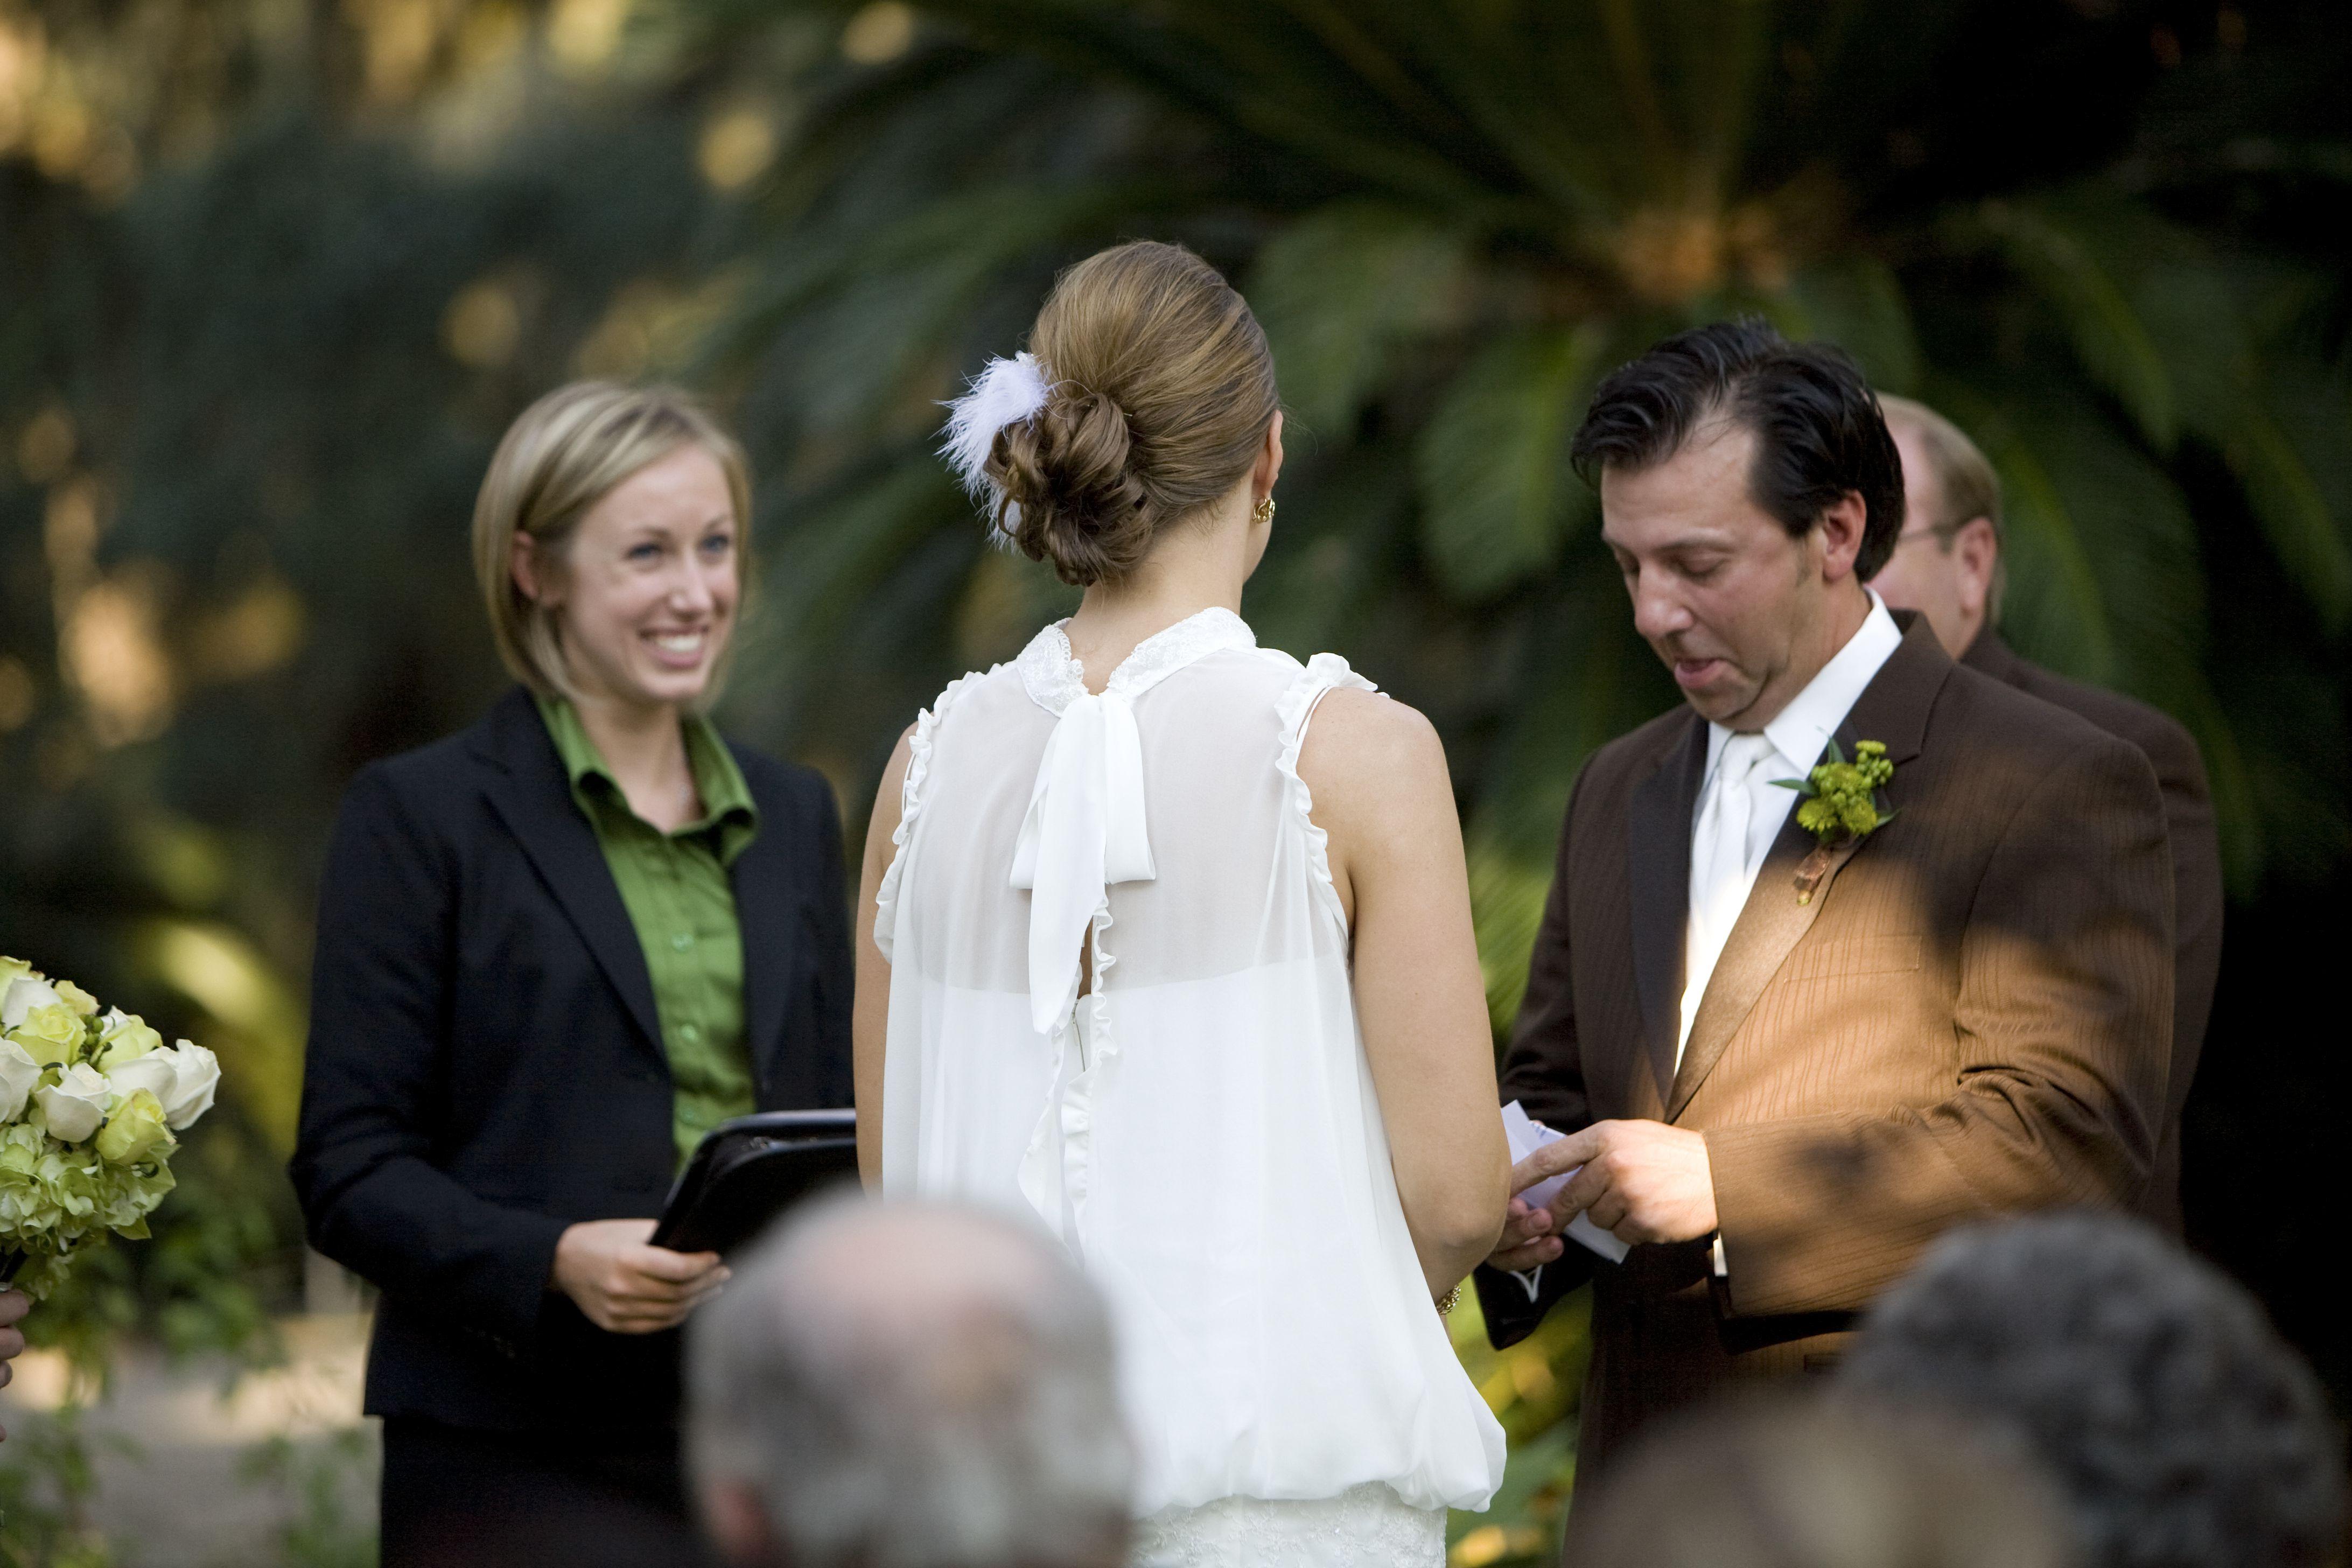 Meet Amanda your Tallahassee Wedding Officiant